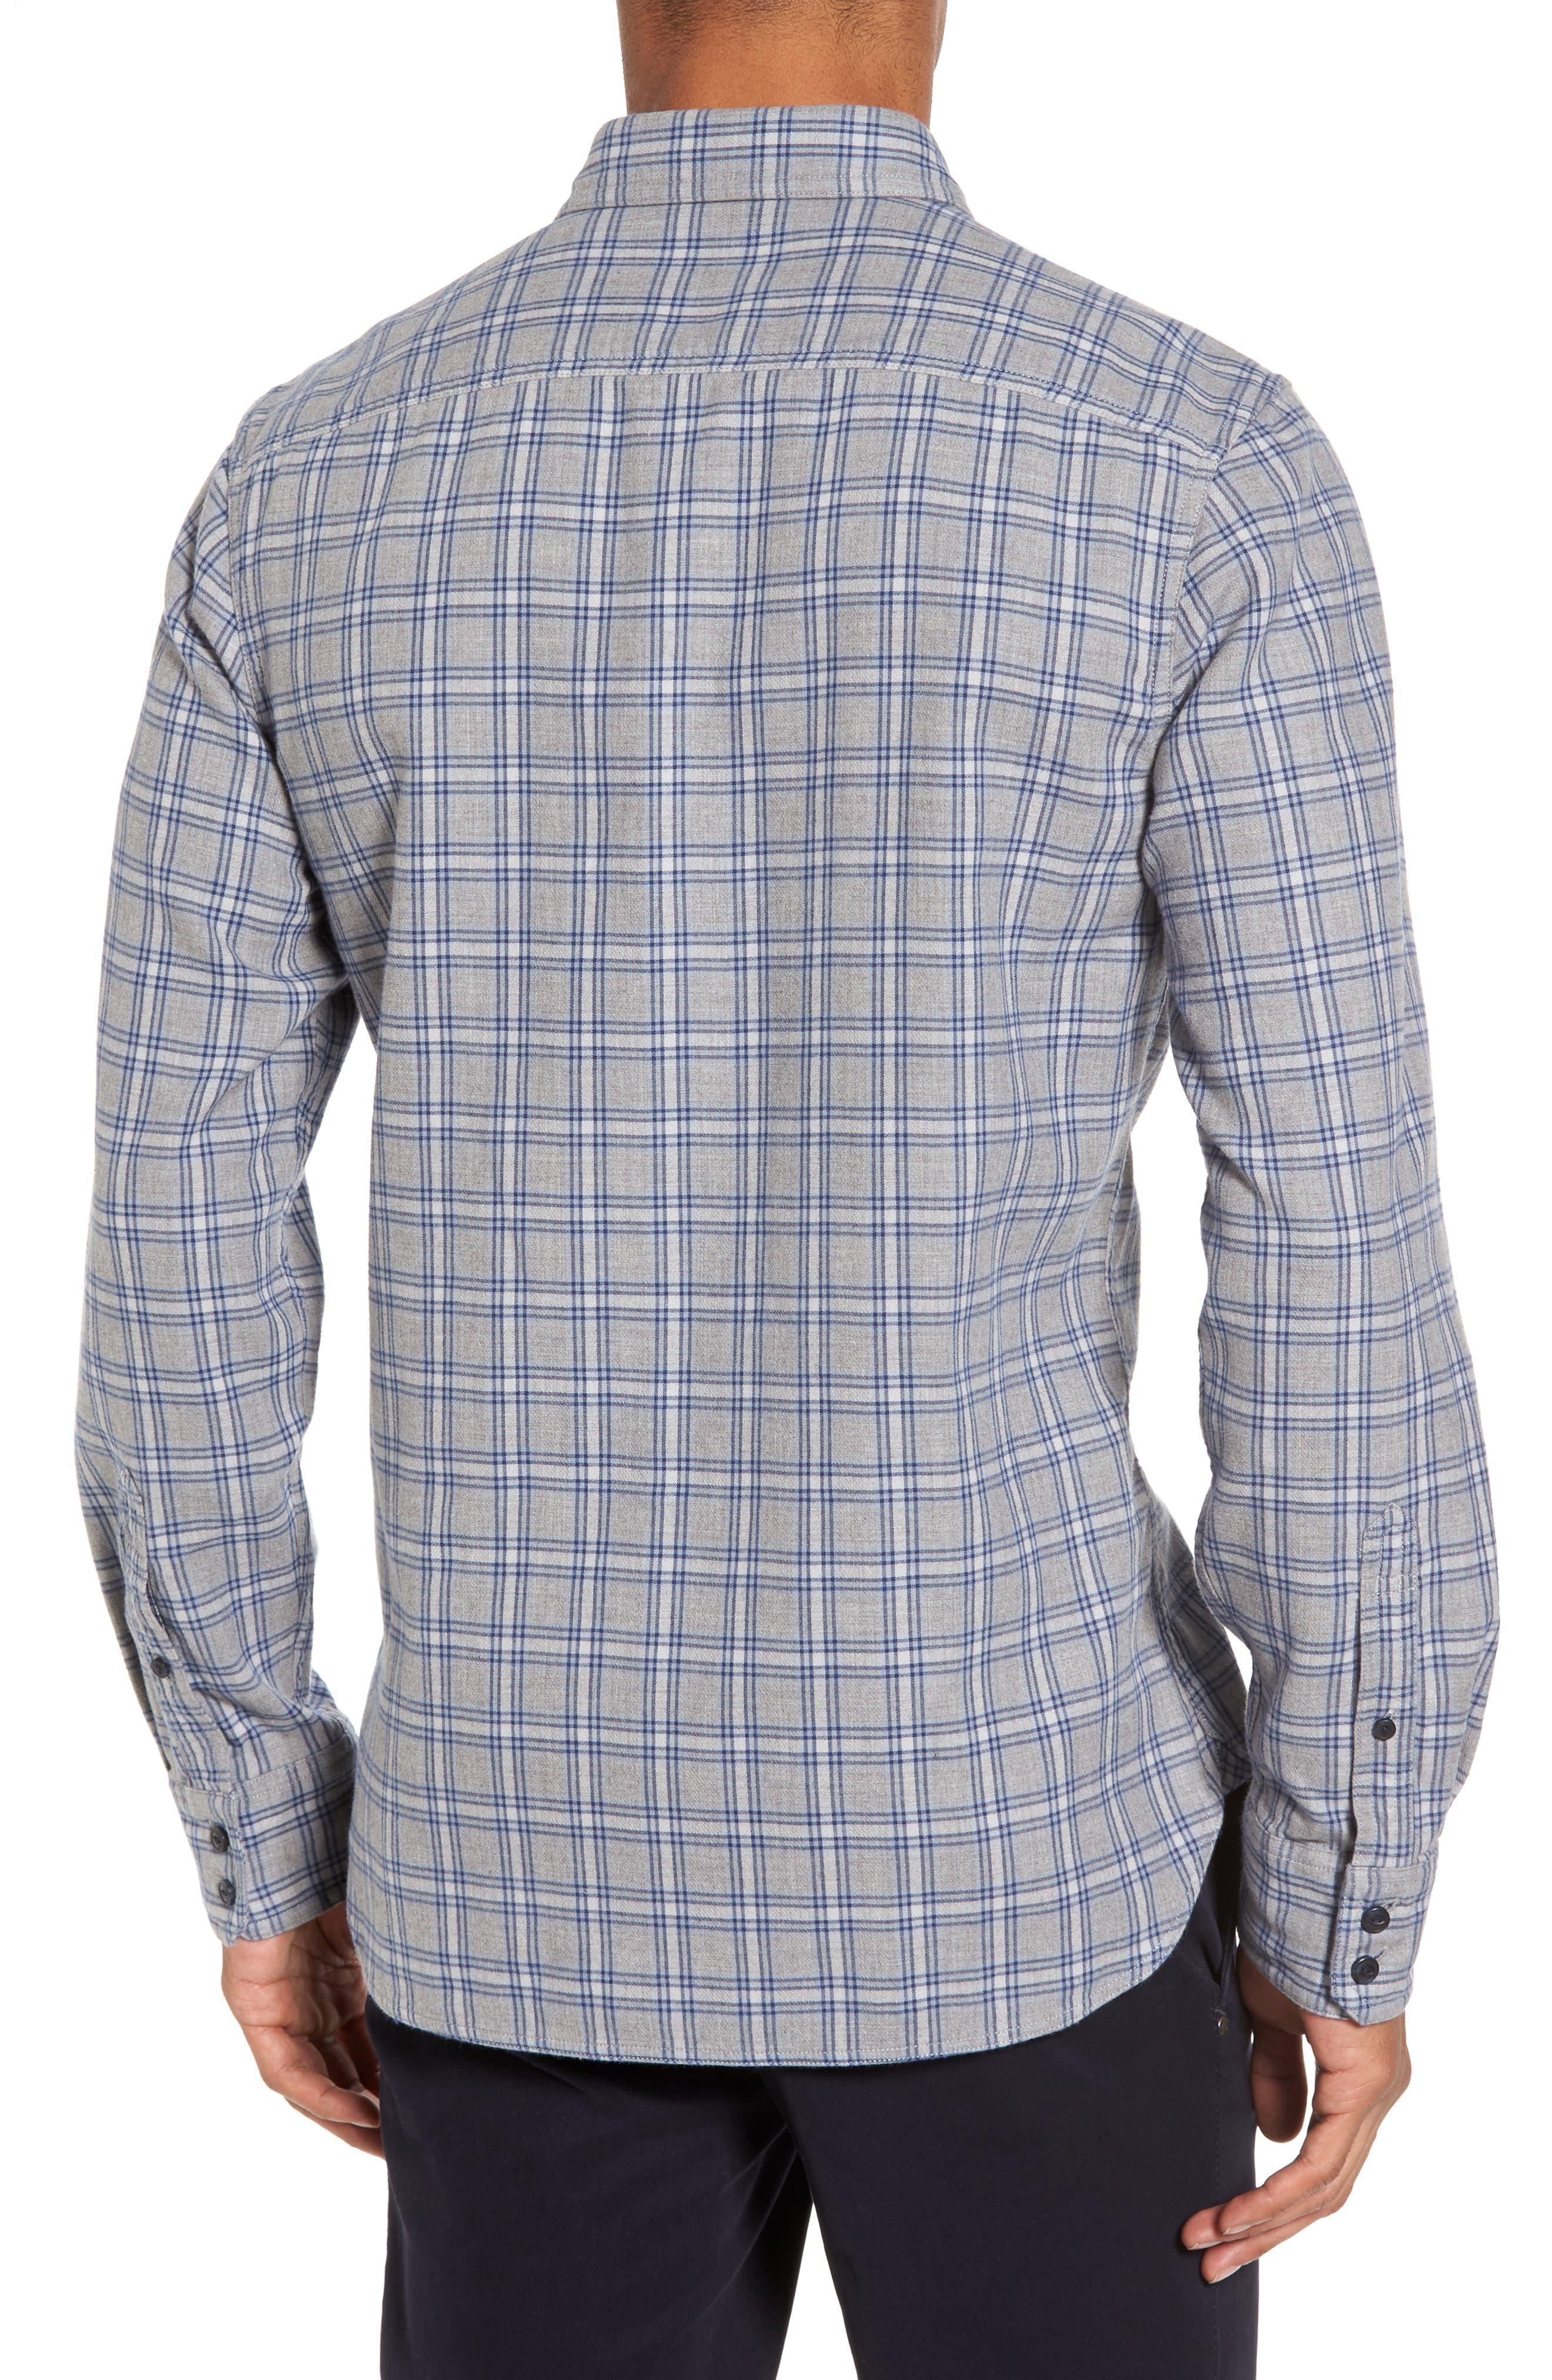 Workwear Duofold Check Sport Shirt,                             Alternate thumbnail 2, color,                             Navy Iris Grey Plaid Duofold